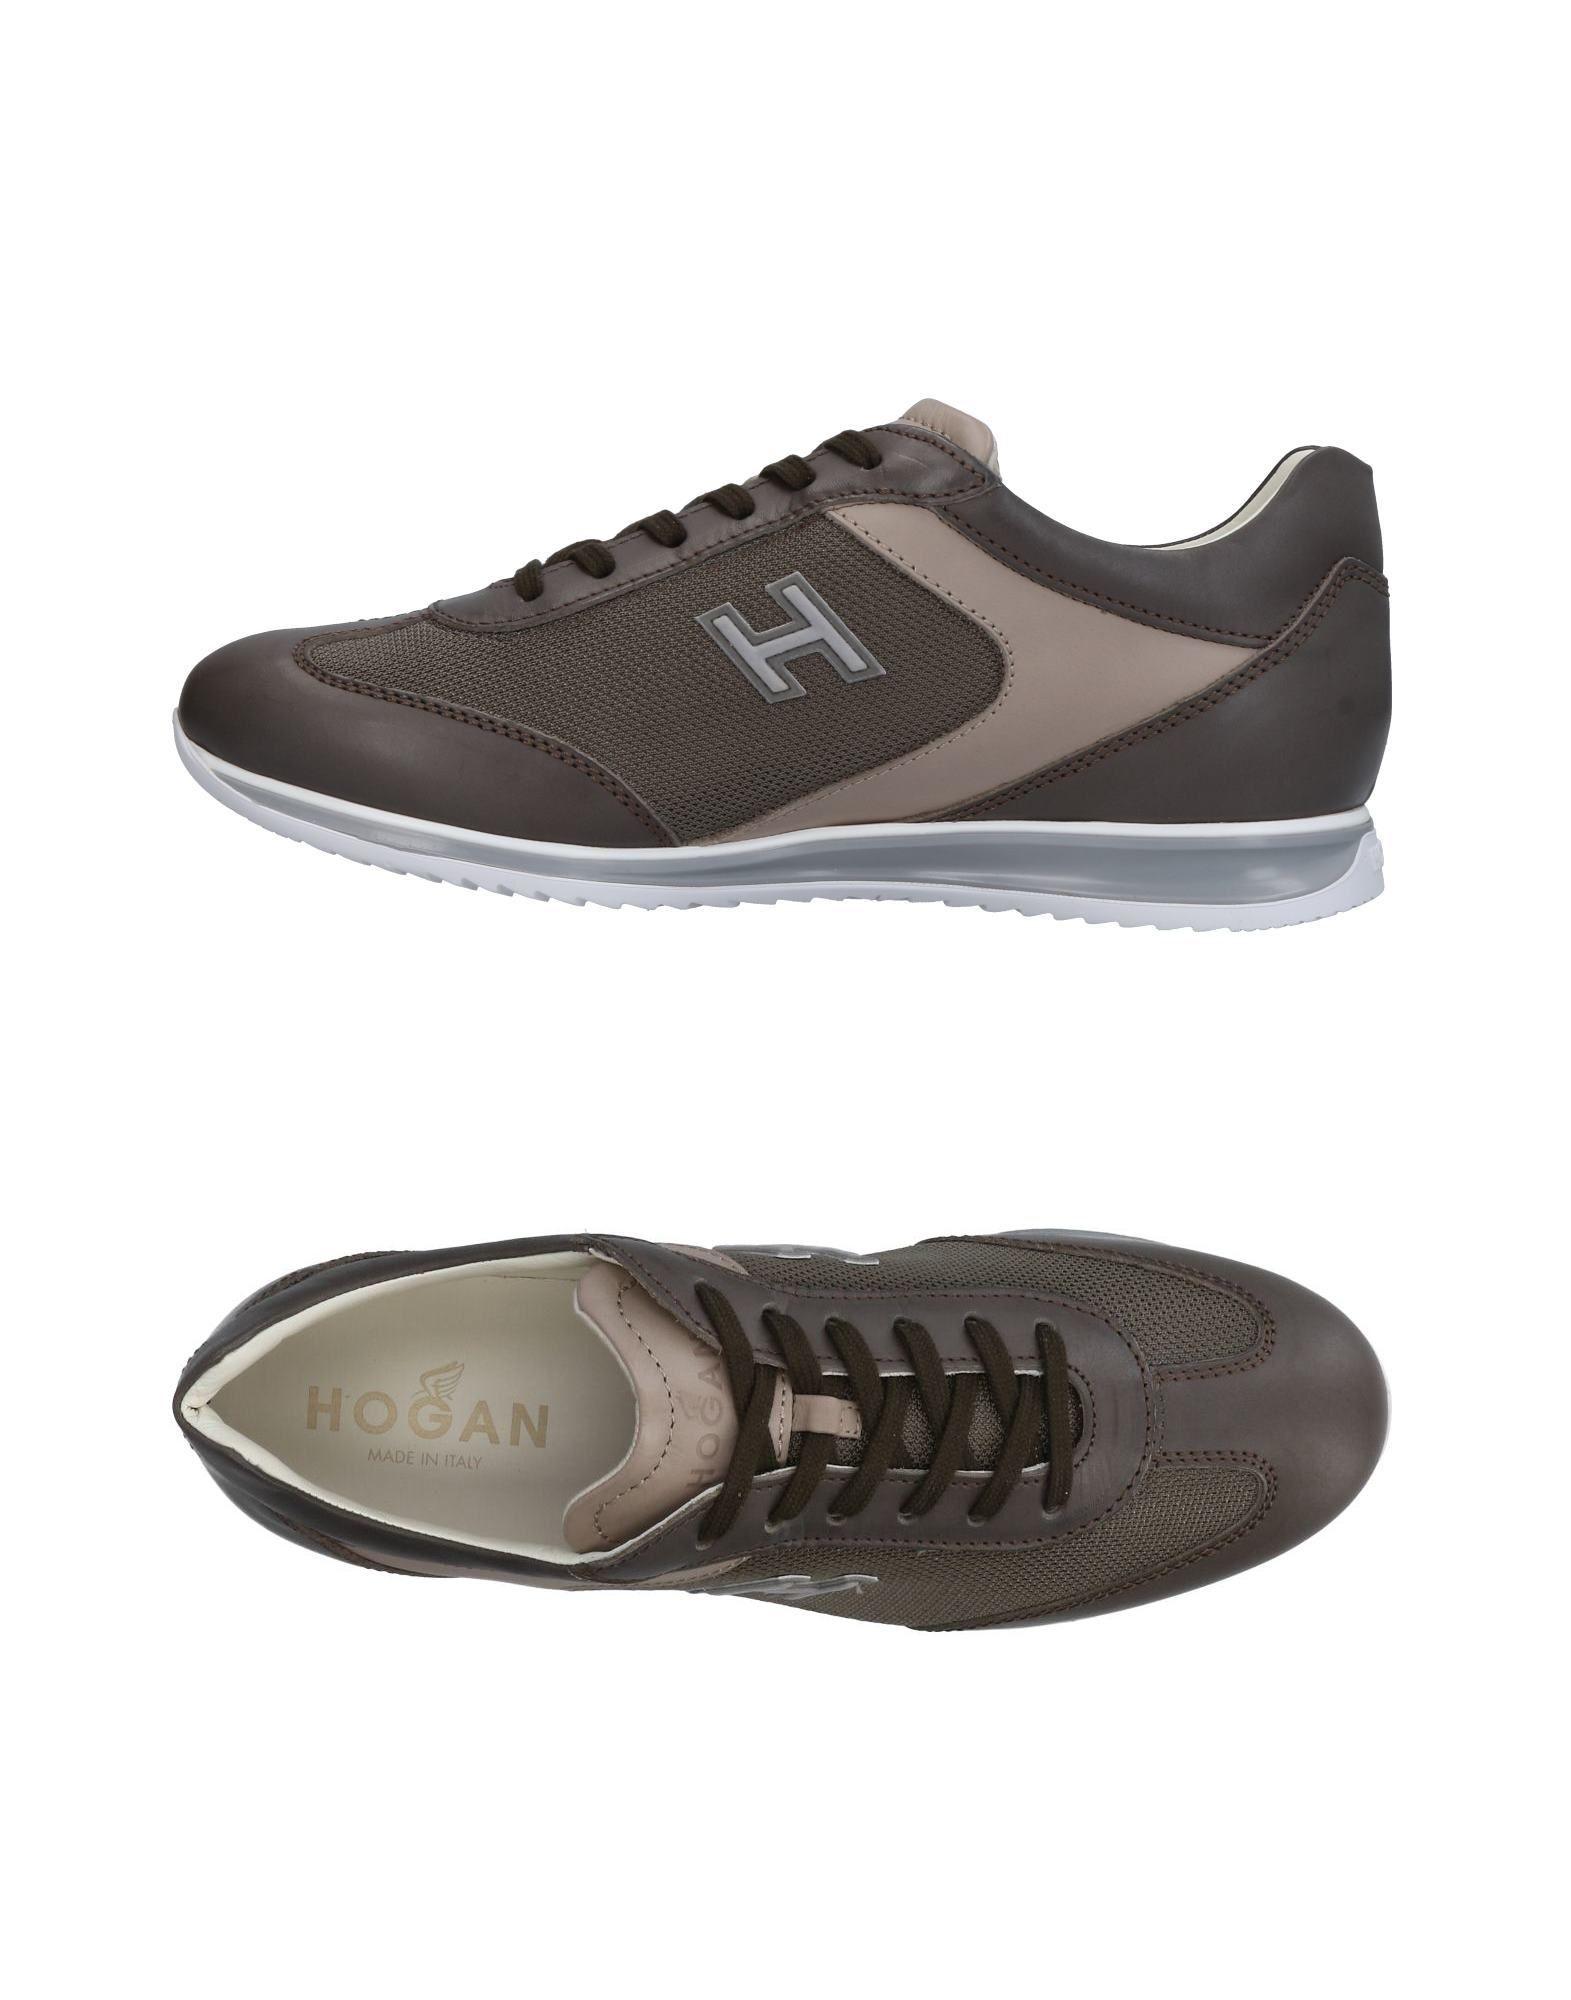 Hogan Sneakers Herren  11435734FU Gute Qualität beliebte Schuhe